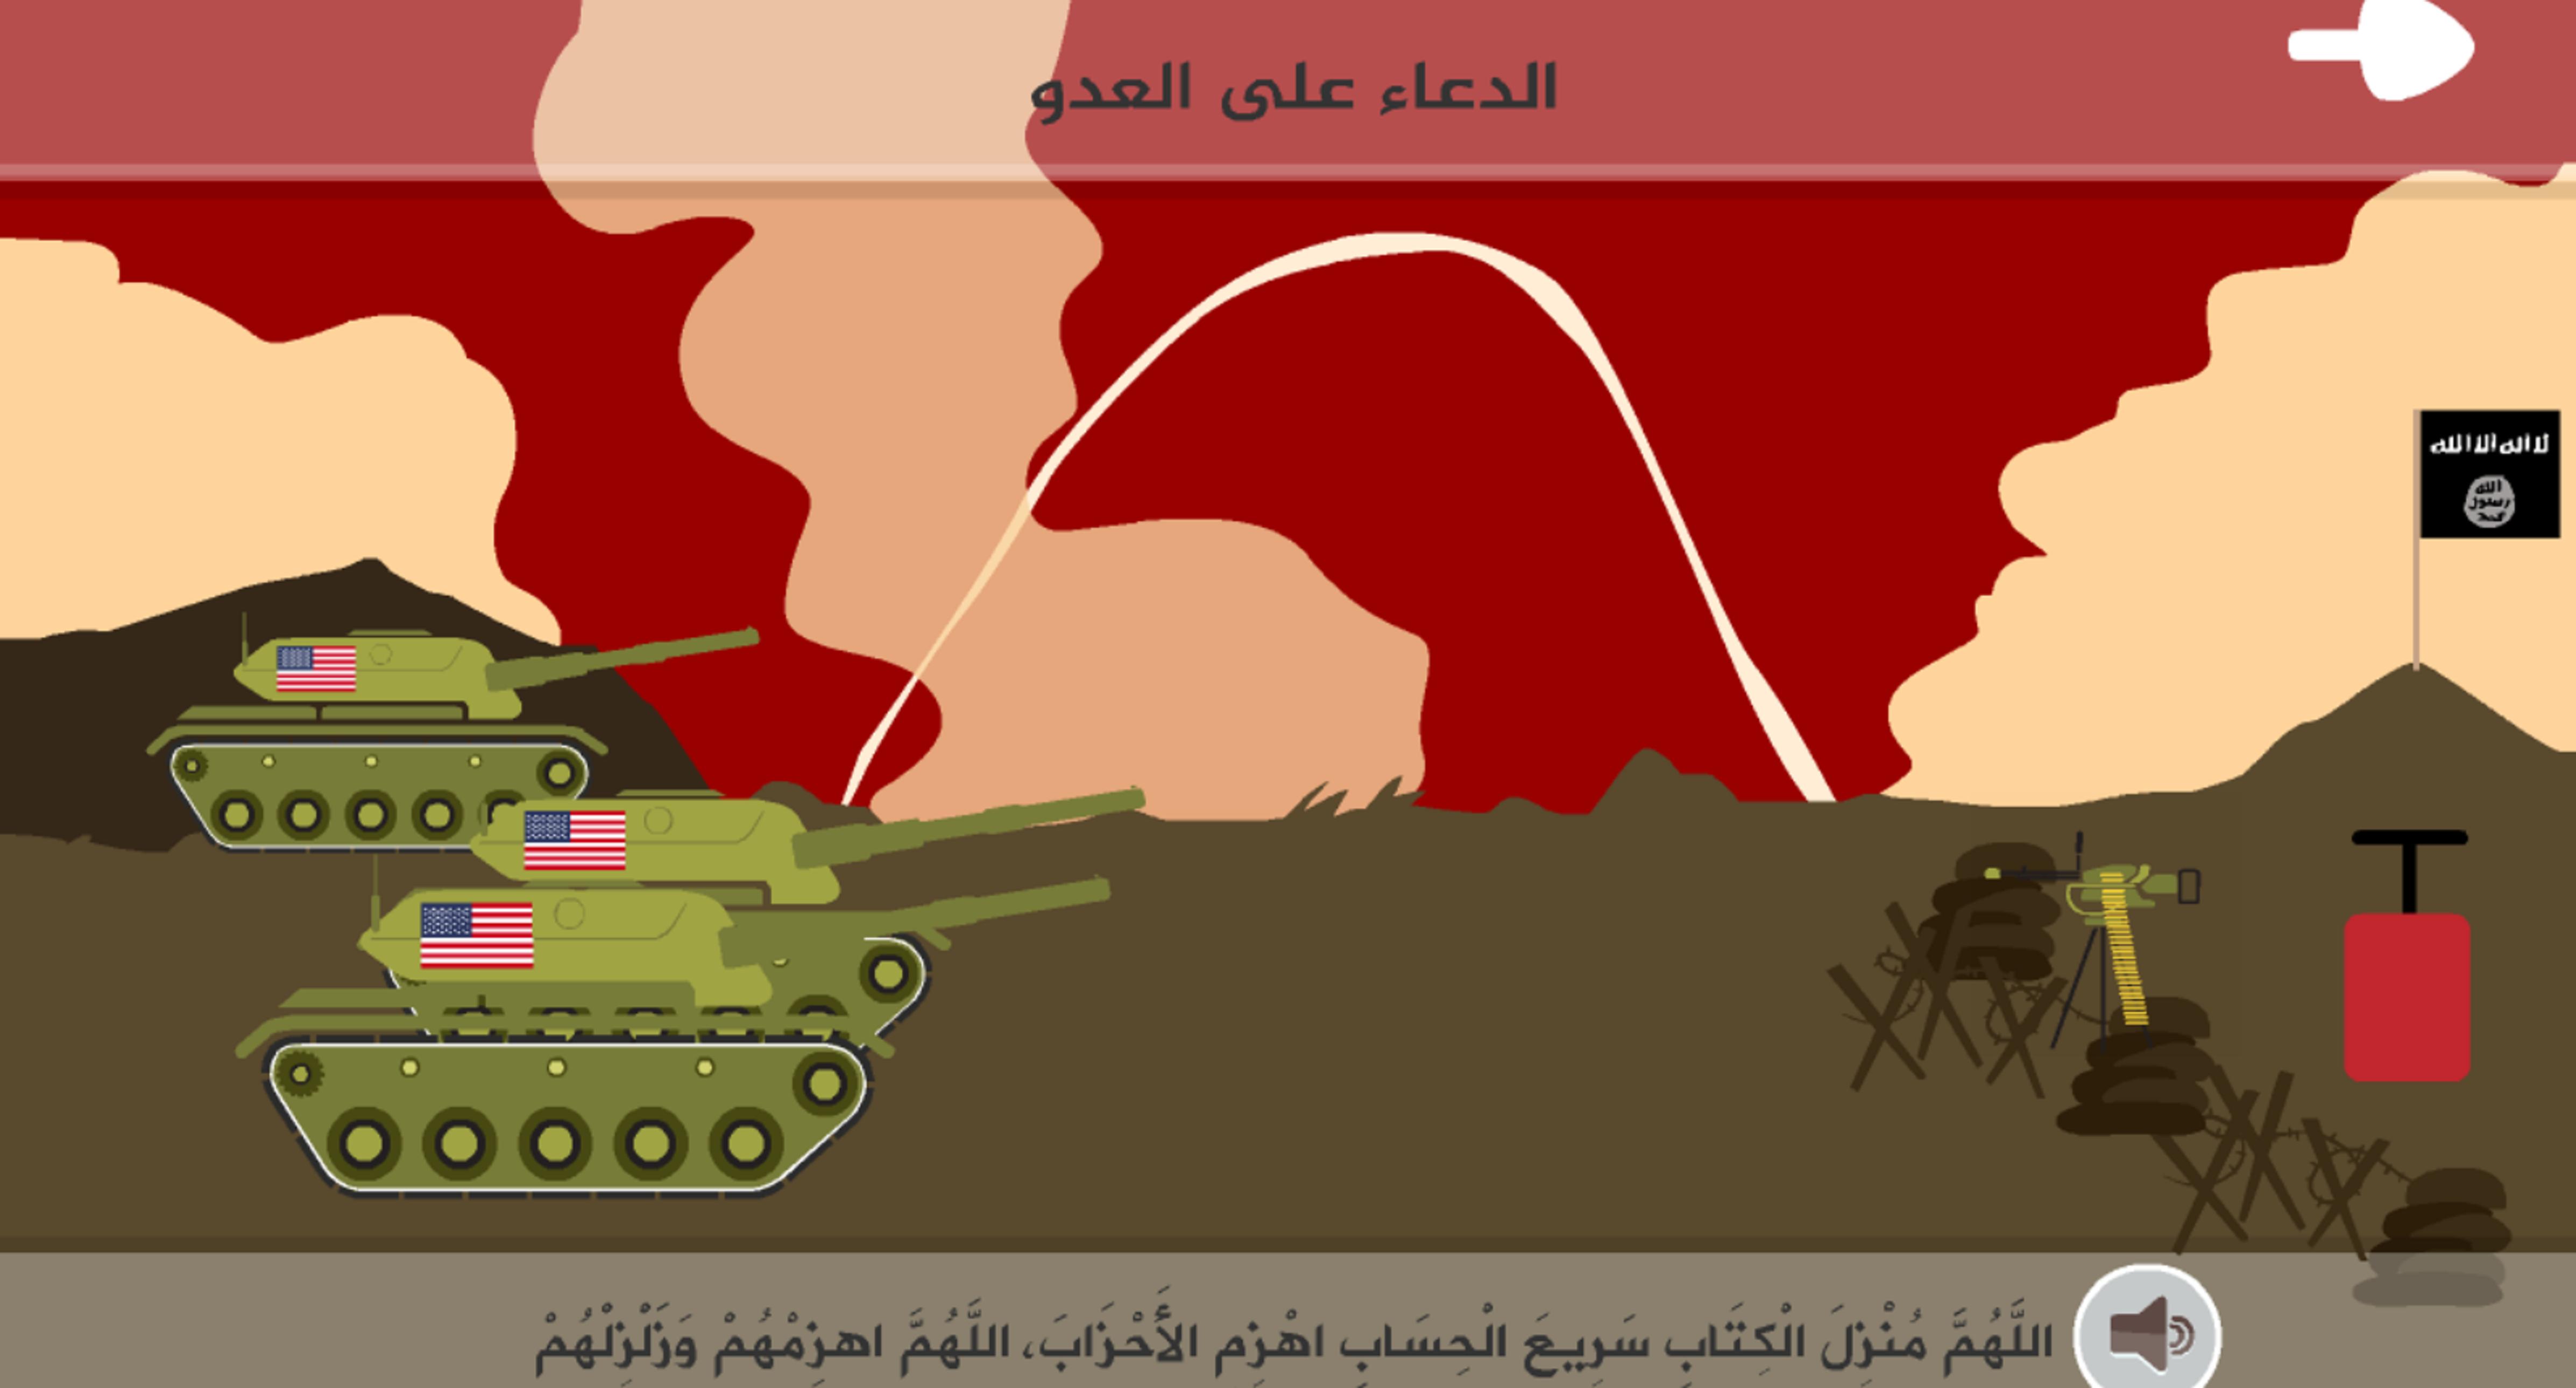 ISIS prayer app